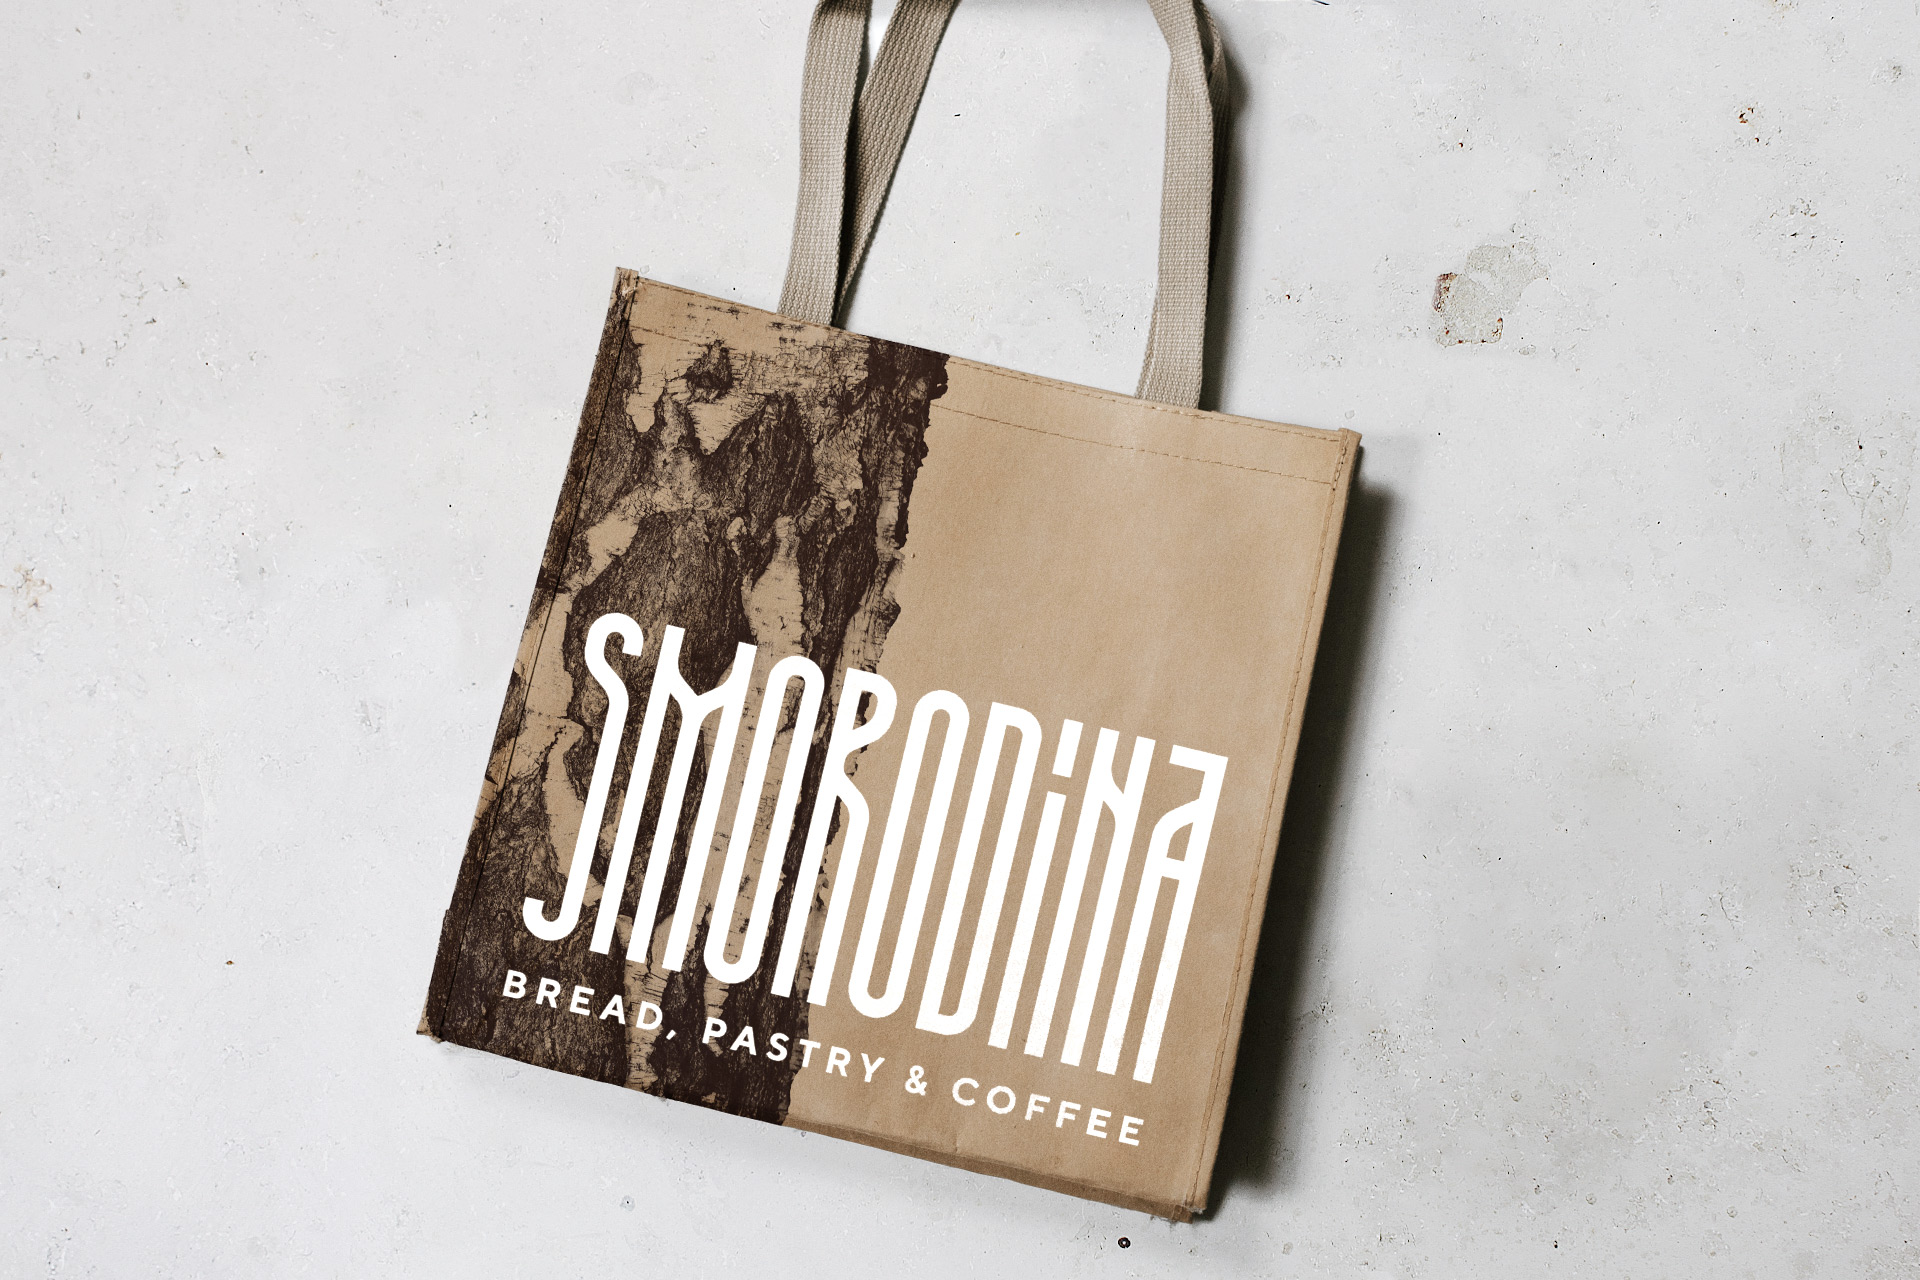 SMO-001-shopper